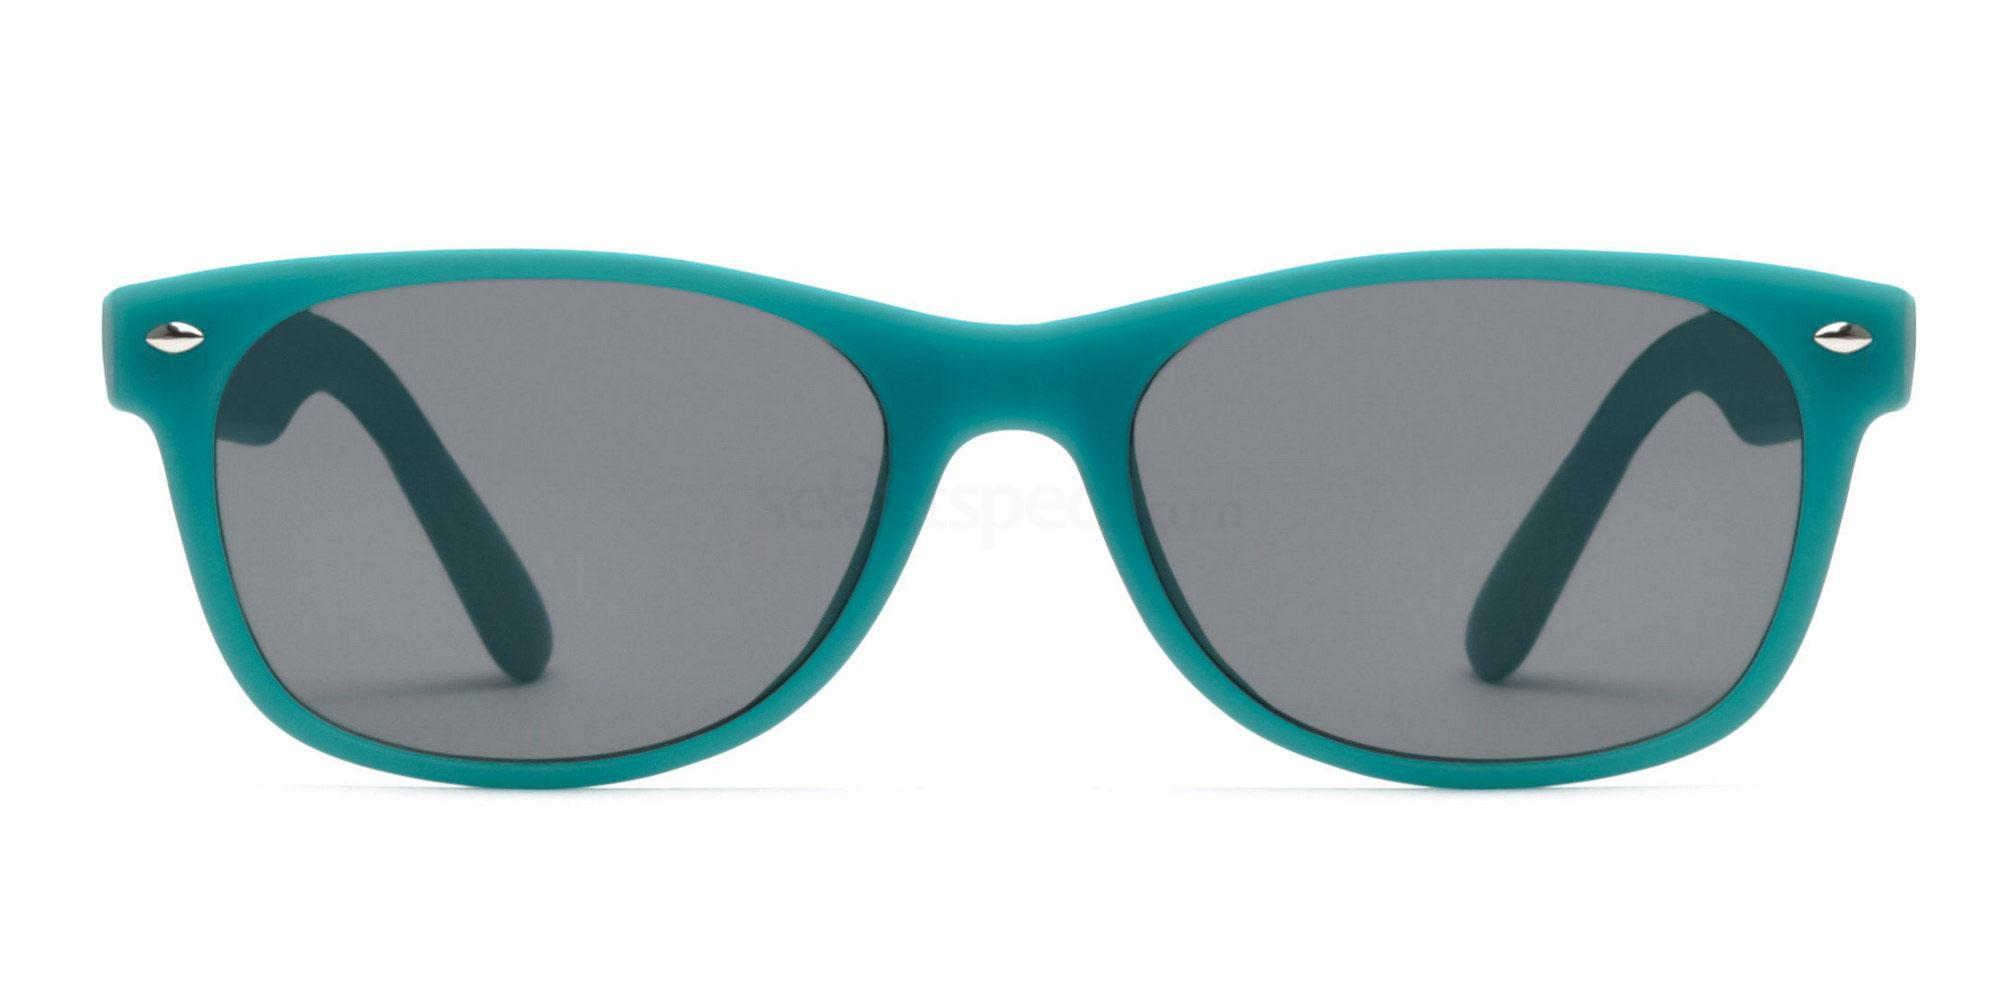 Green S8122 - Green (Sunglasses) Sunglasses, Savannah